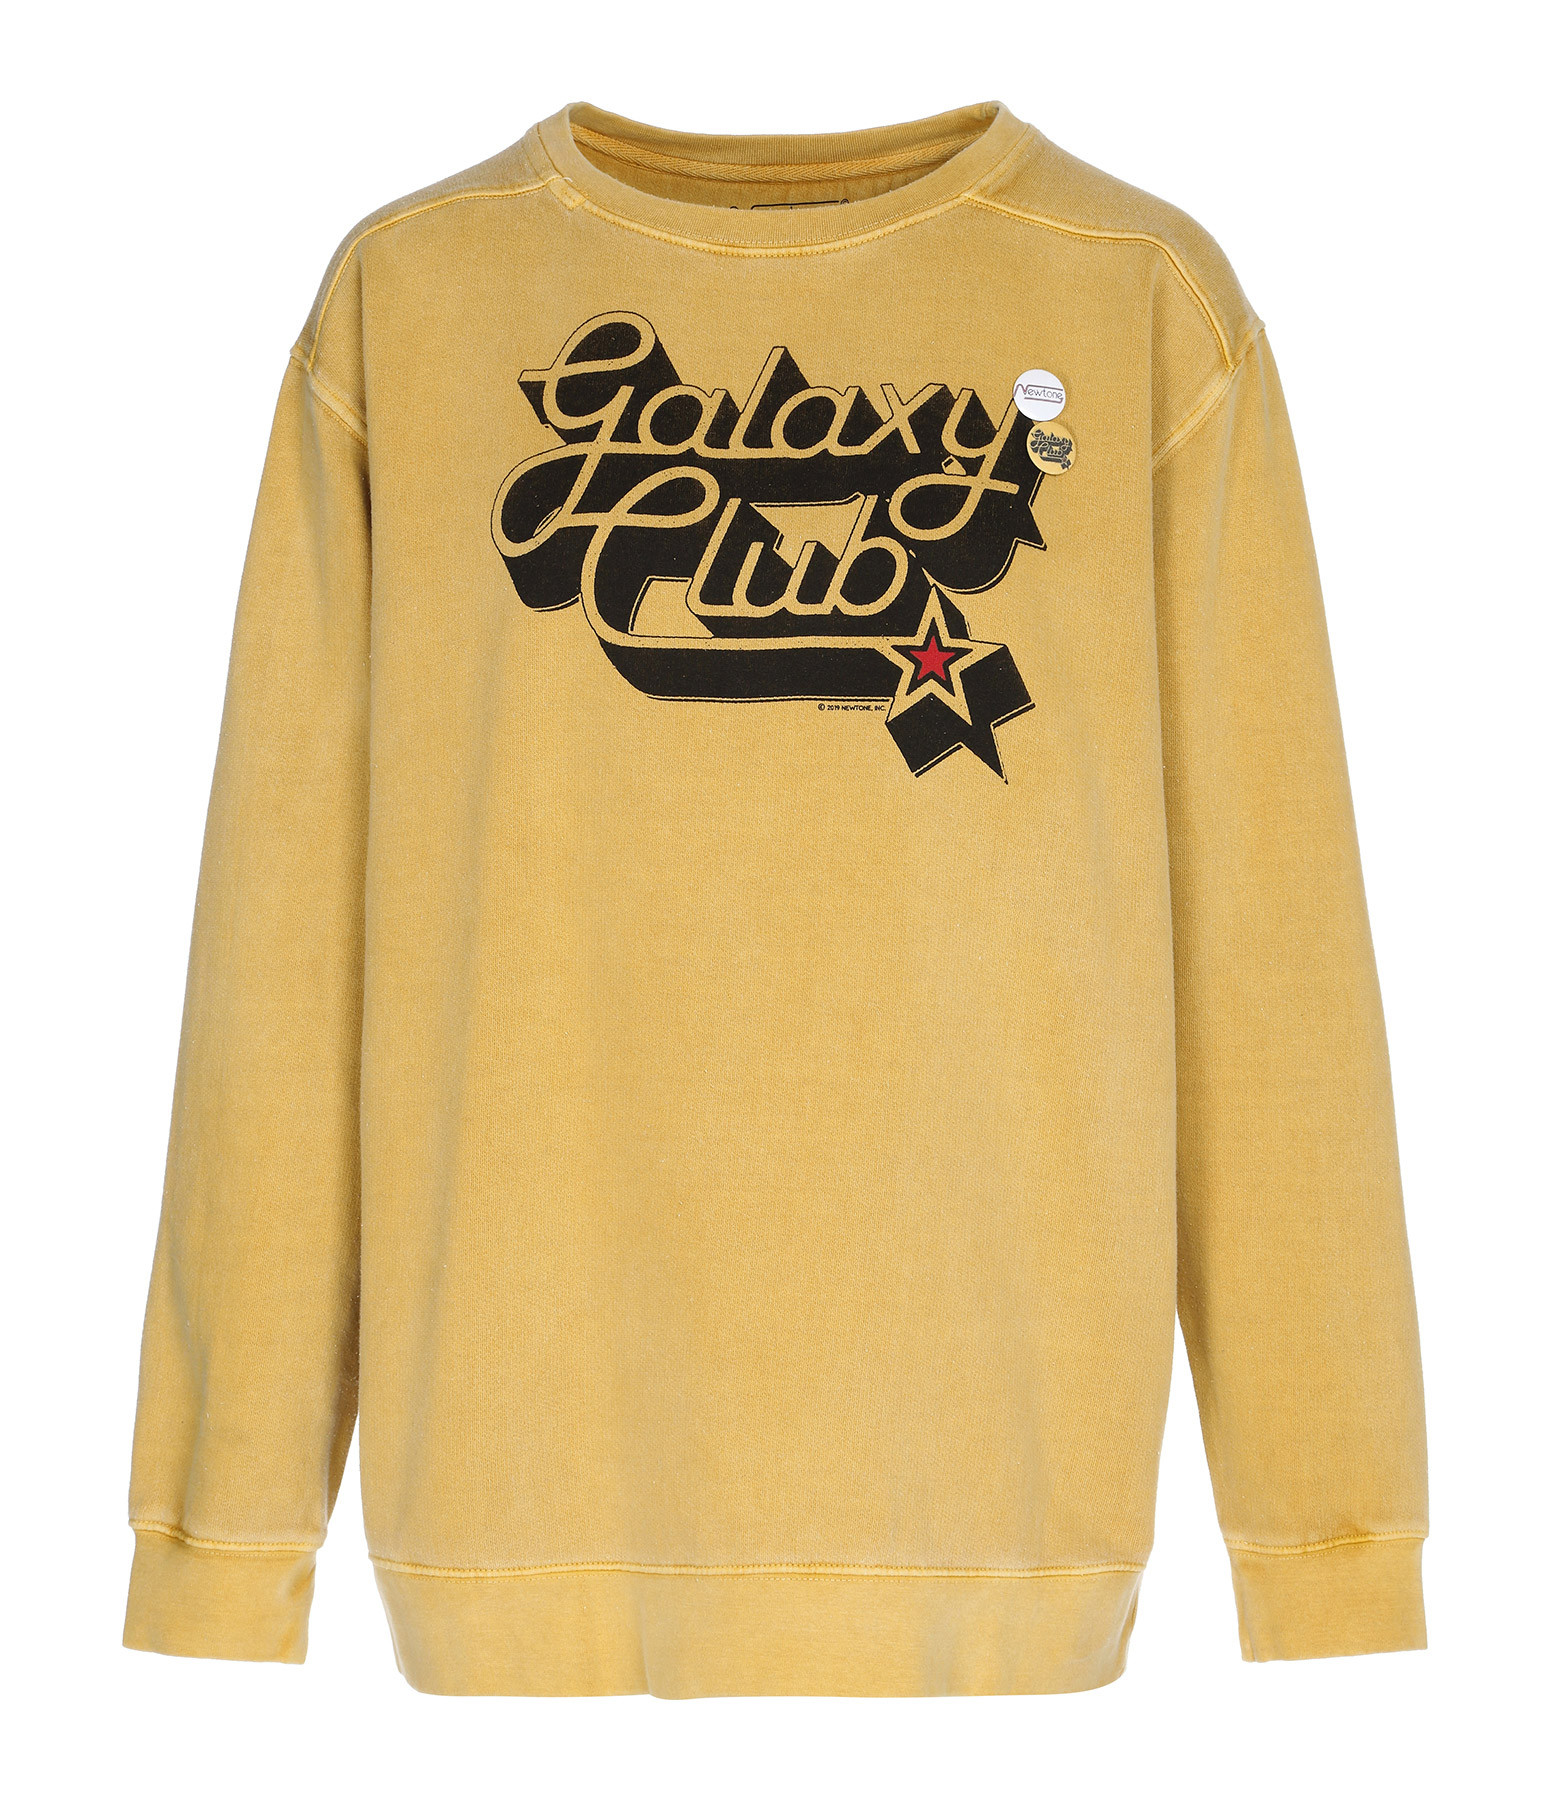 NEWTONE - Sweatshirt Galaxy Club Coton Moutarde